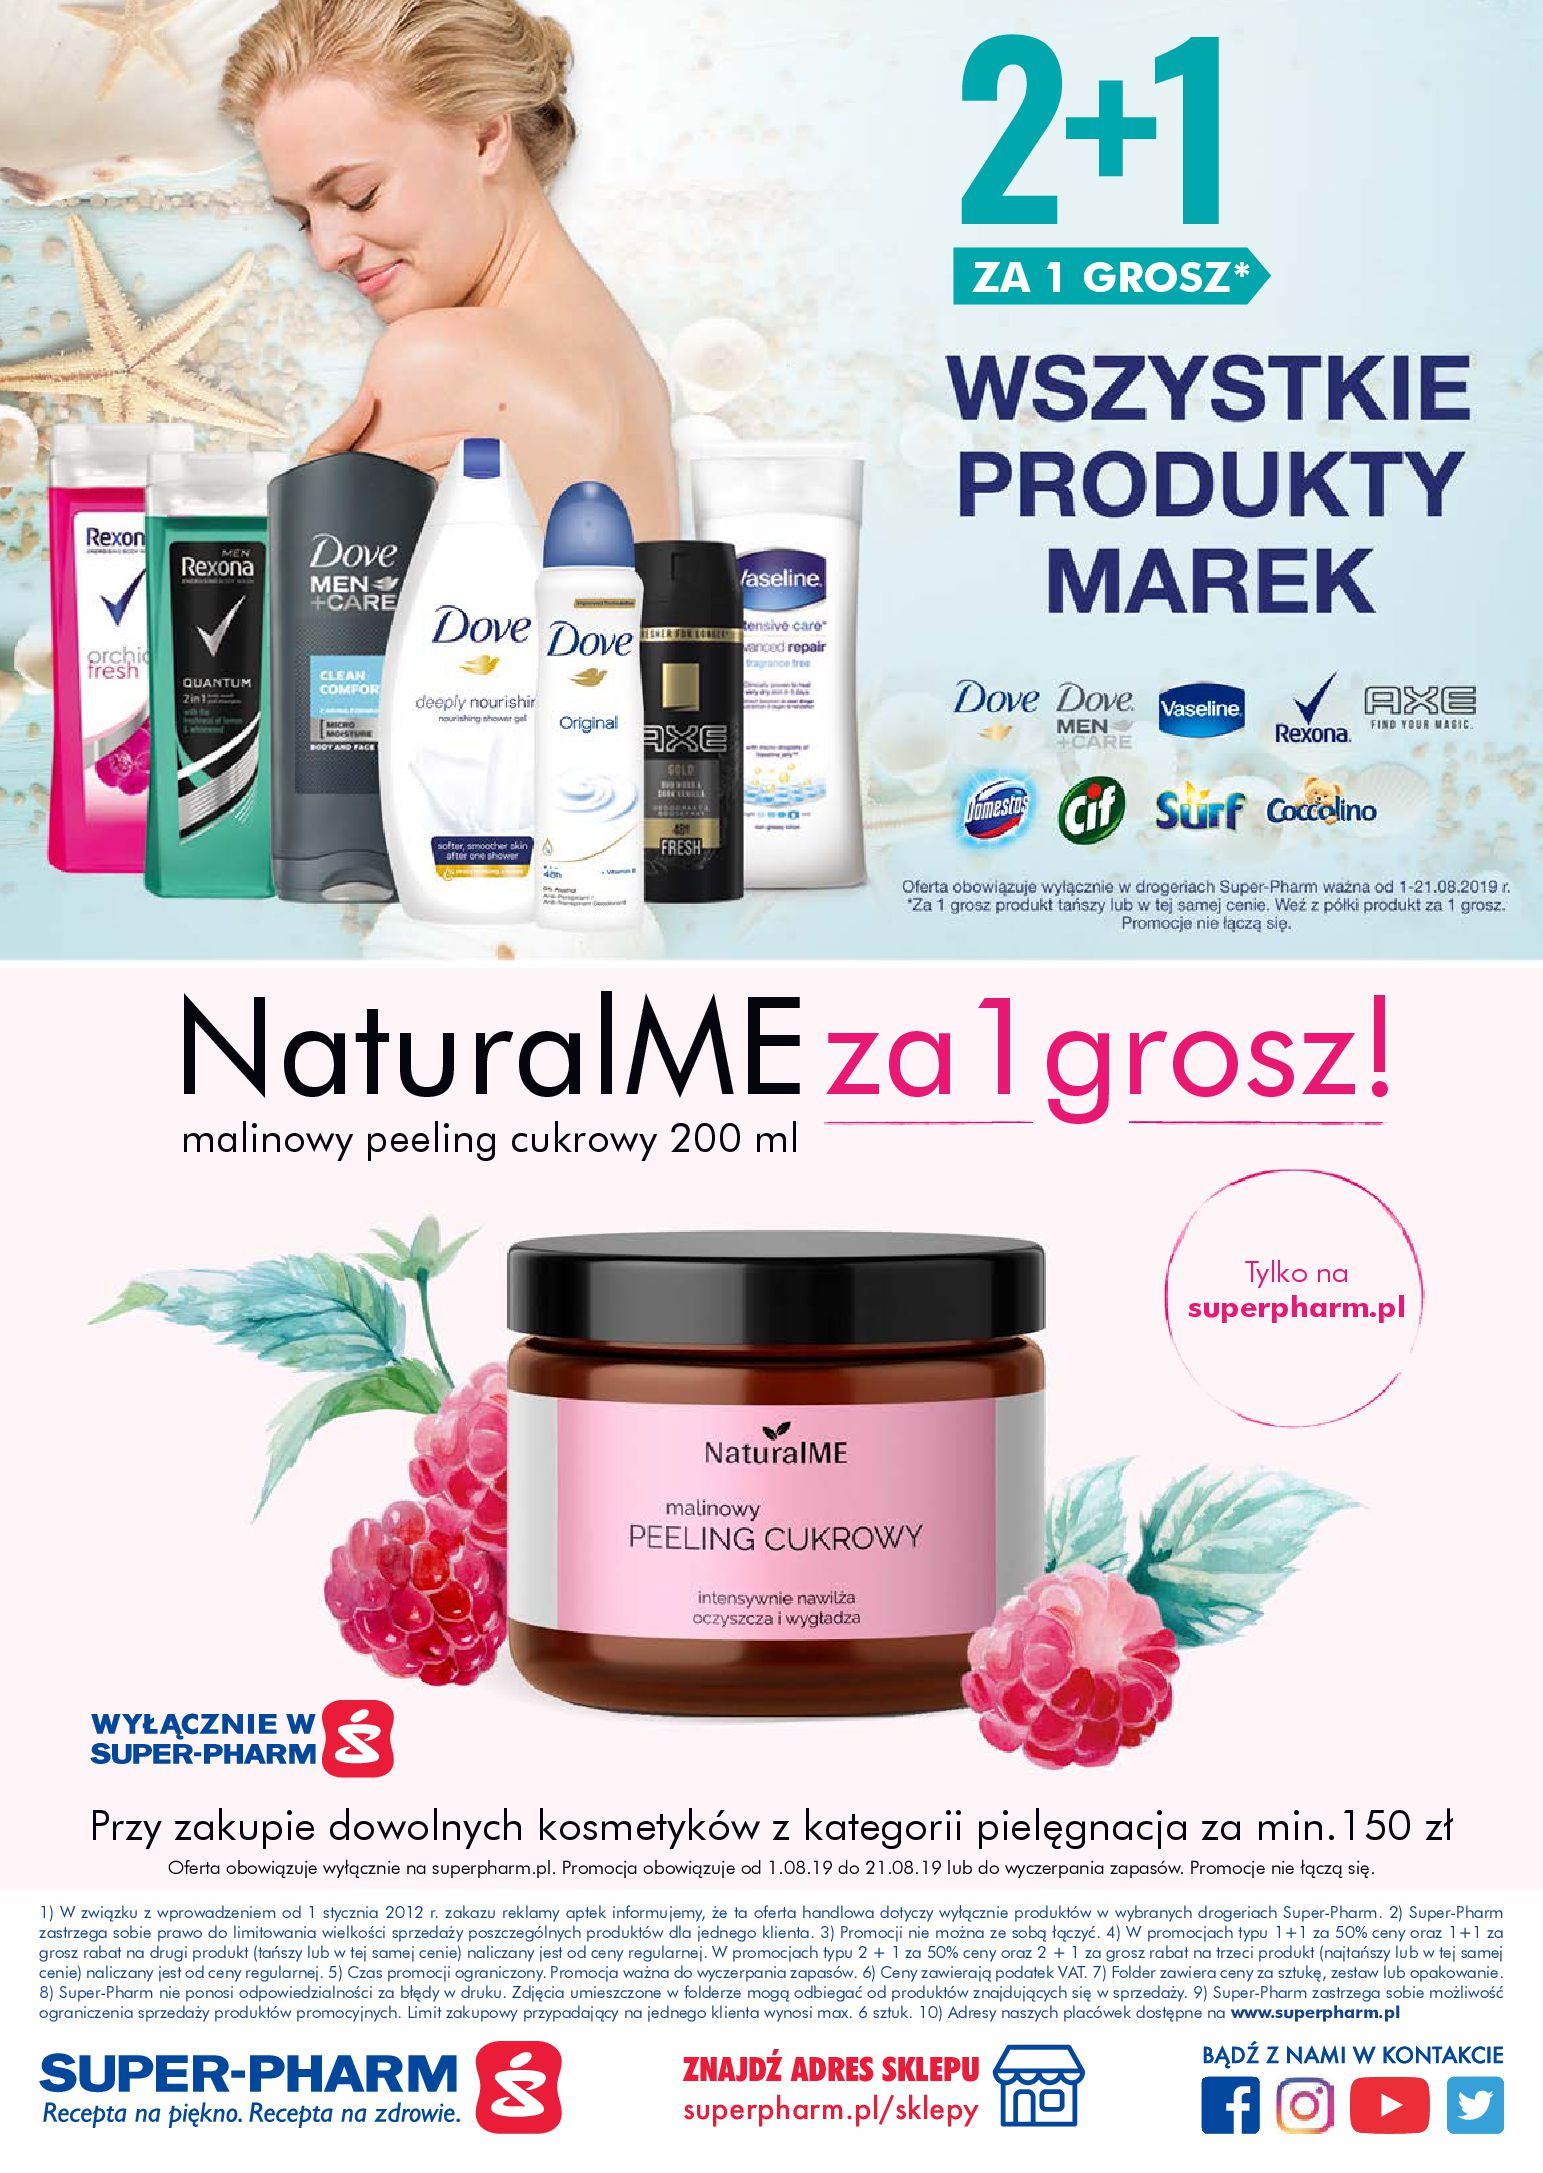 Gazetka Super-Pharm - Owocowe Lato-31.07.2019-21.08.2019-page-24